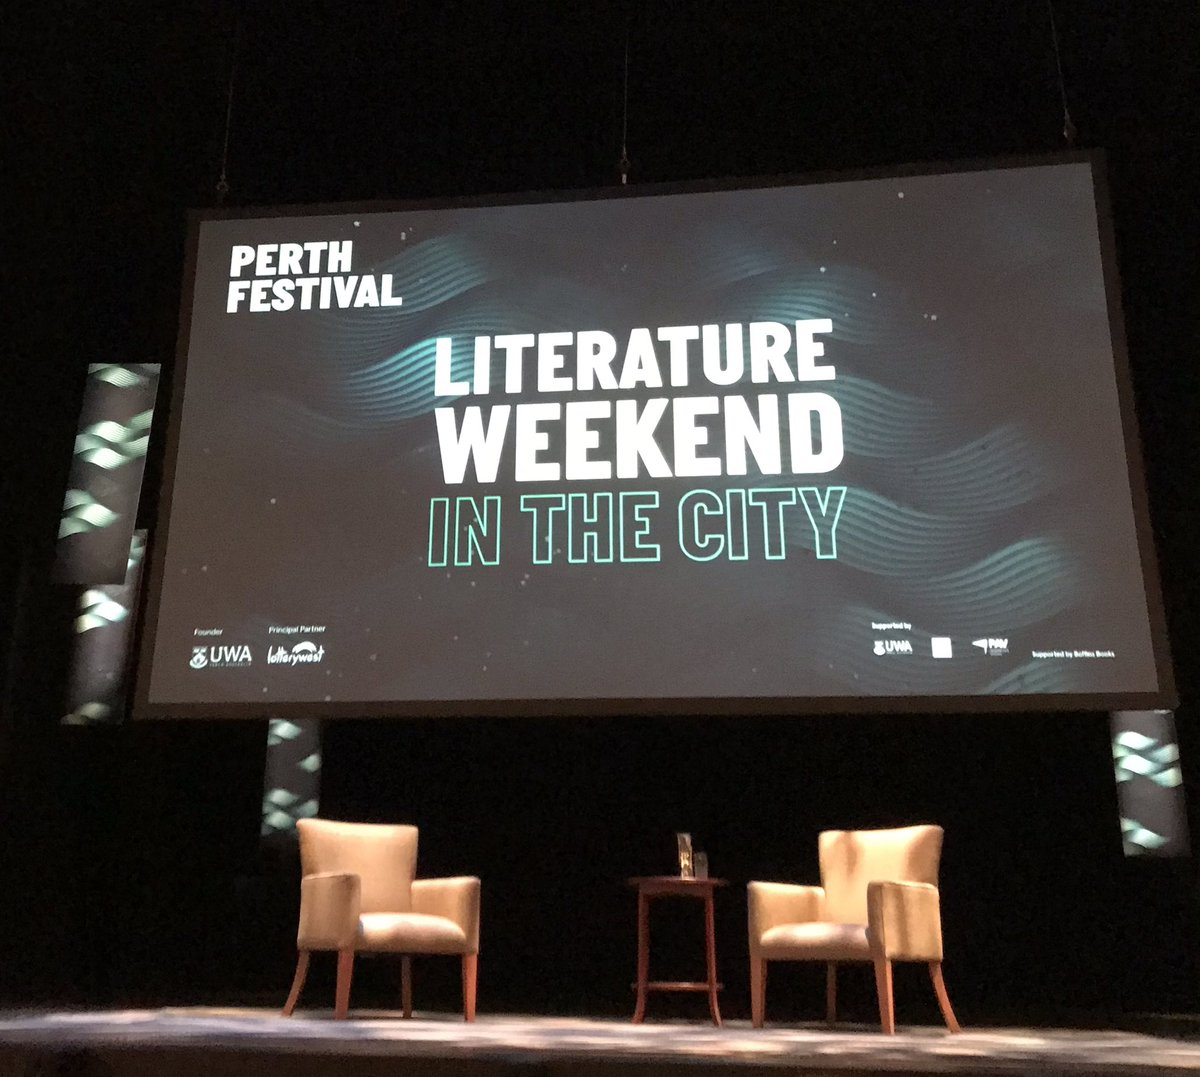 Trent Dalton author talk at The Maj @perthfest @HisMajestyT #literatureweekend #perthwriter #perthauthor #trentdalton #perth #perthfest